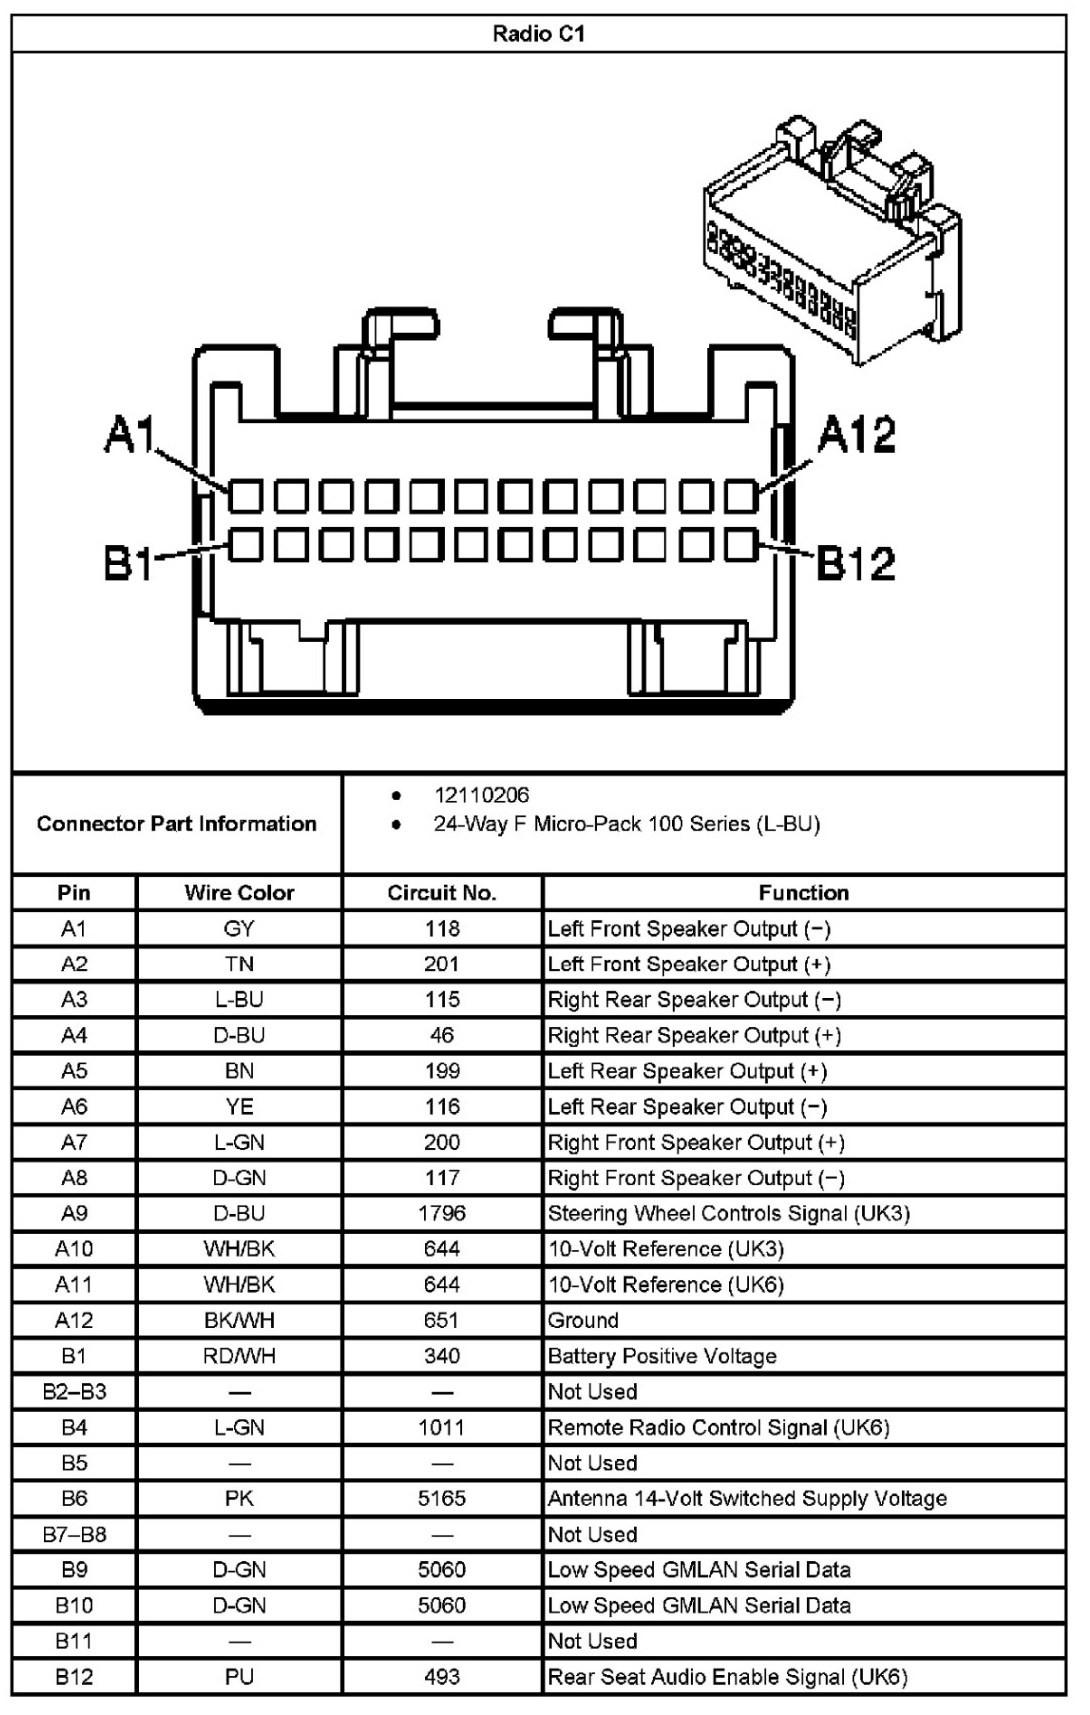 Chevy Impala Radio Wiring Diagram With Electrical 2013 Fair In 2003 Silverado